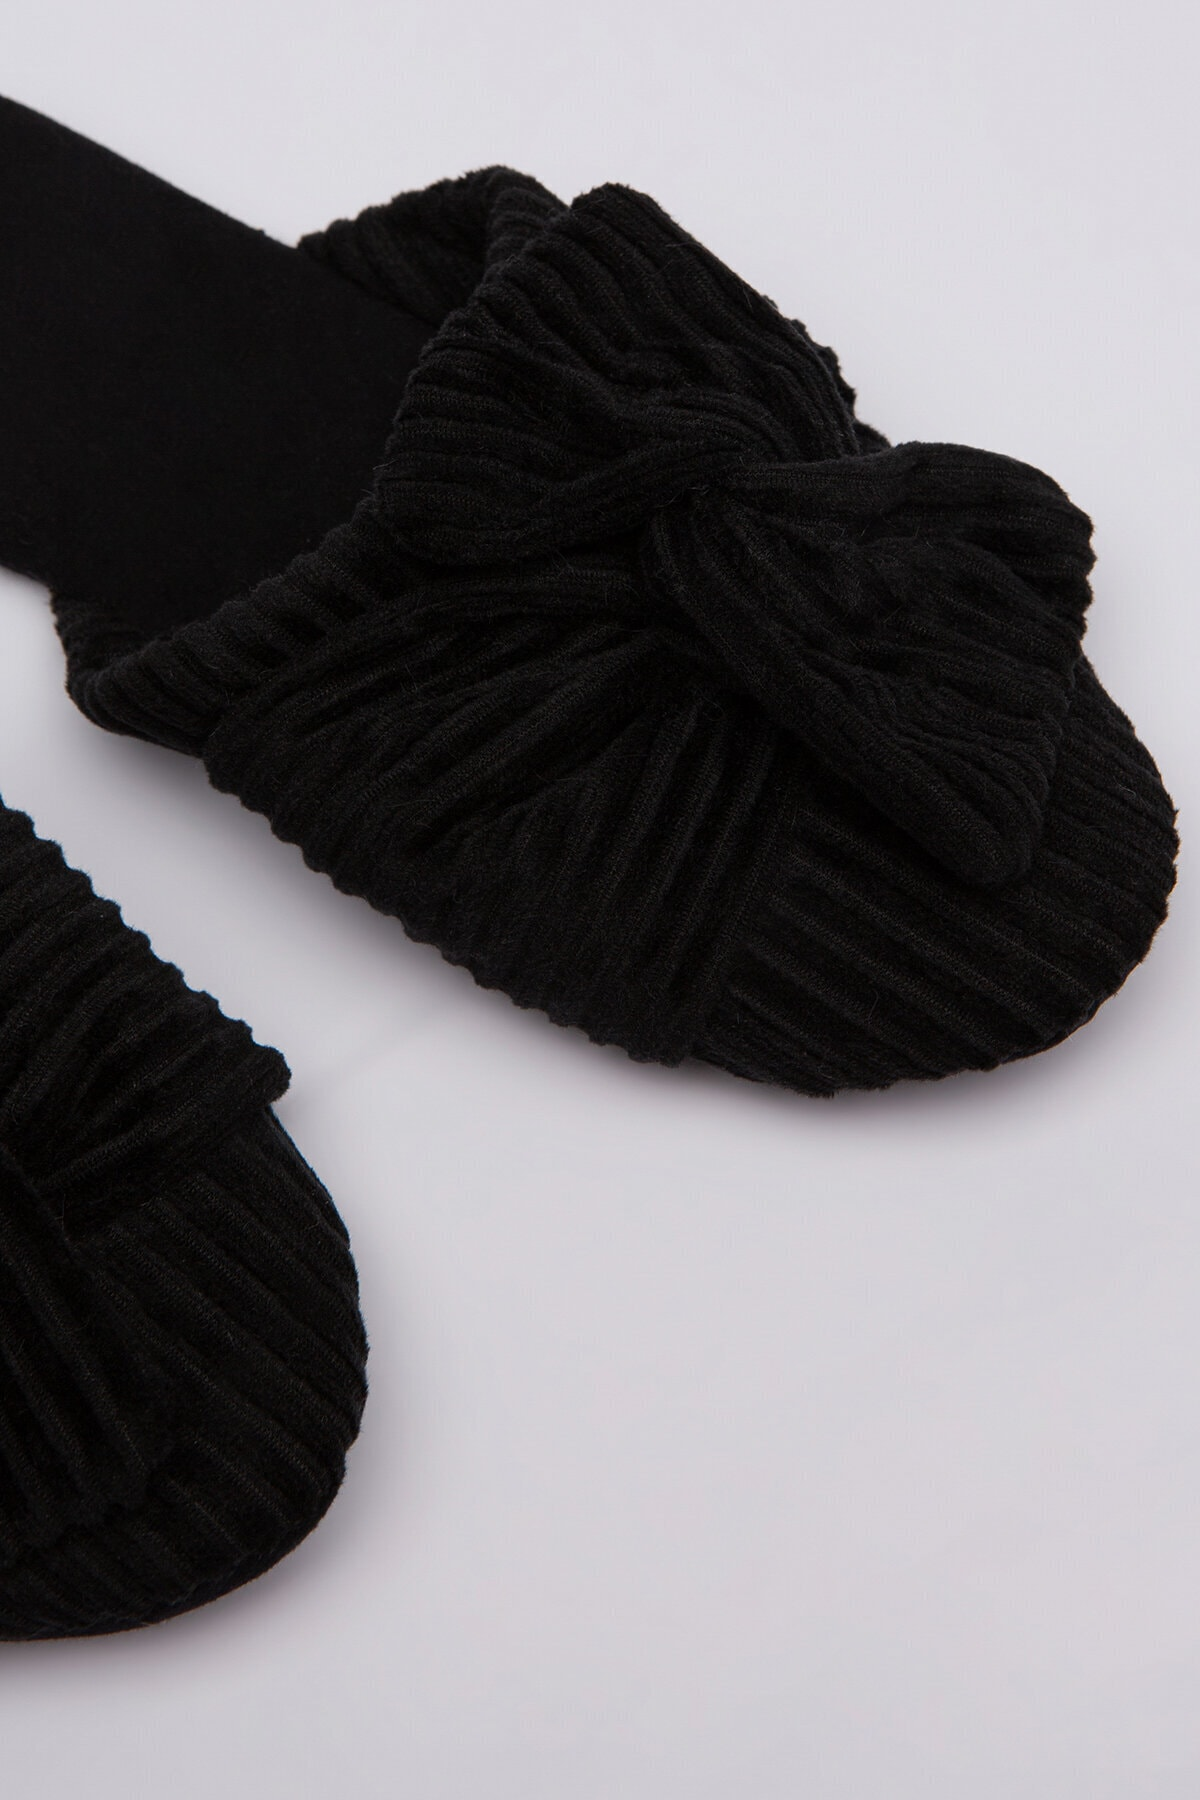 Penti Siyah Koyu Kadife Terlik 2